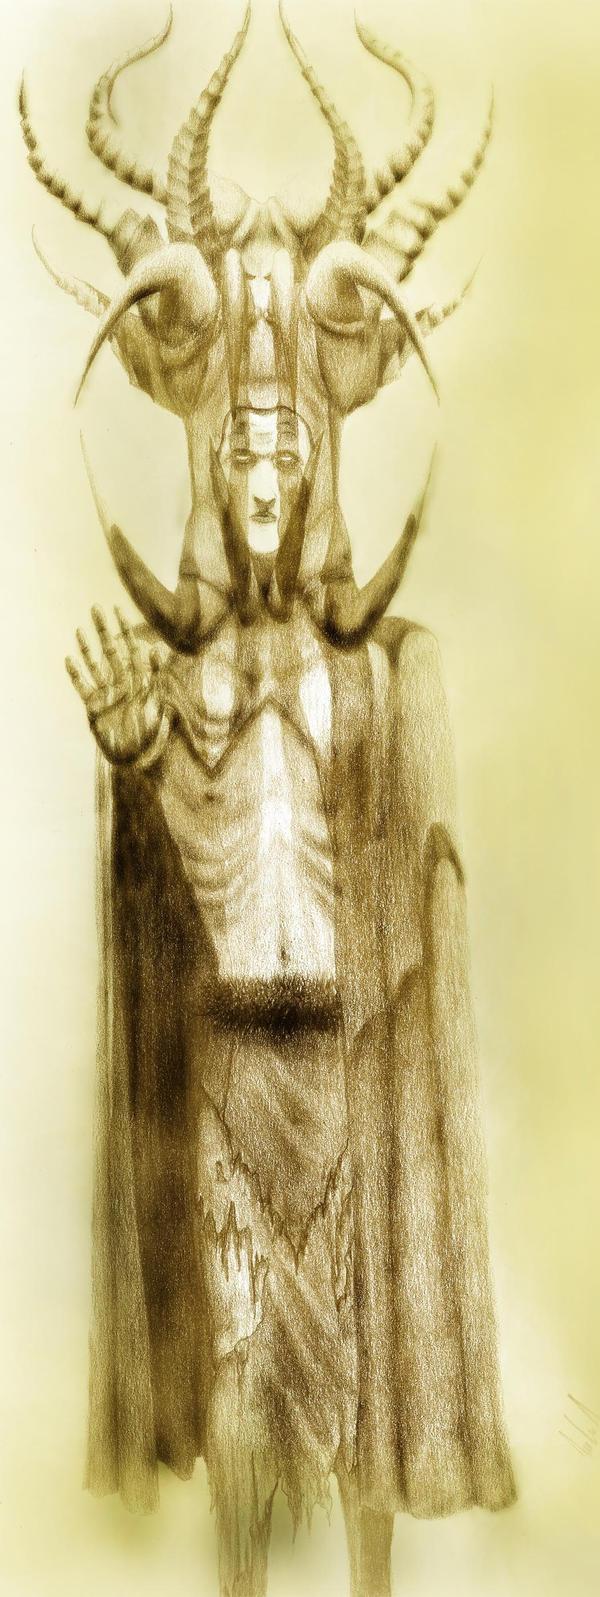 Necromancer by yu-yi